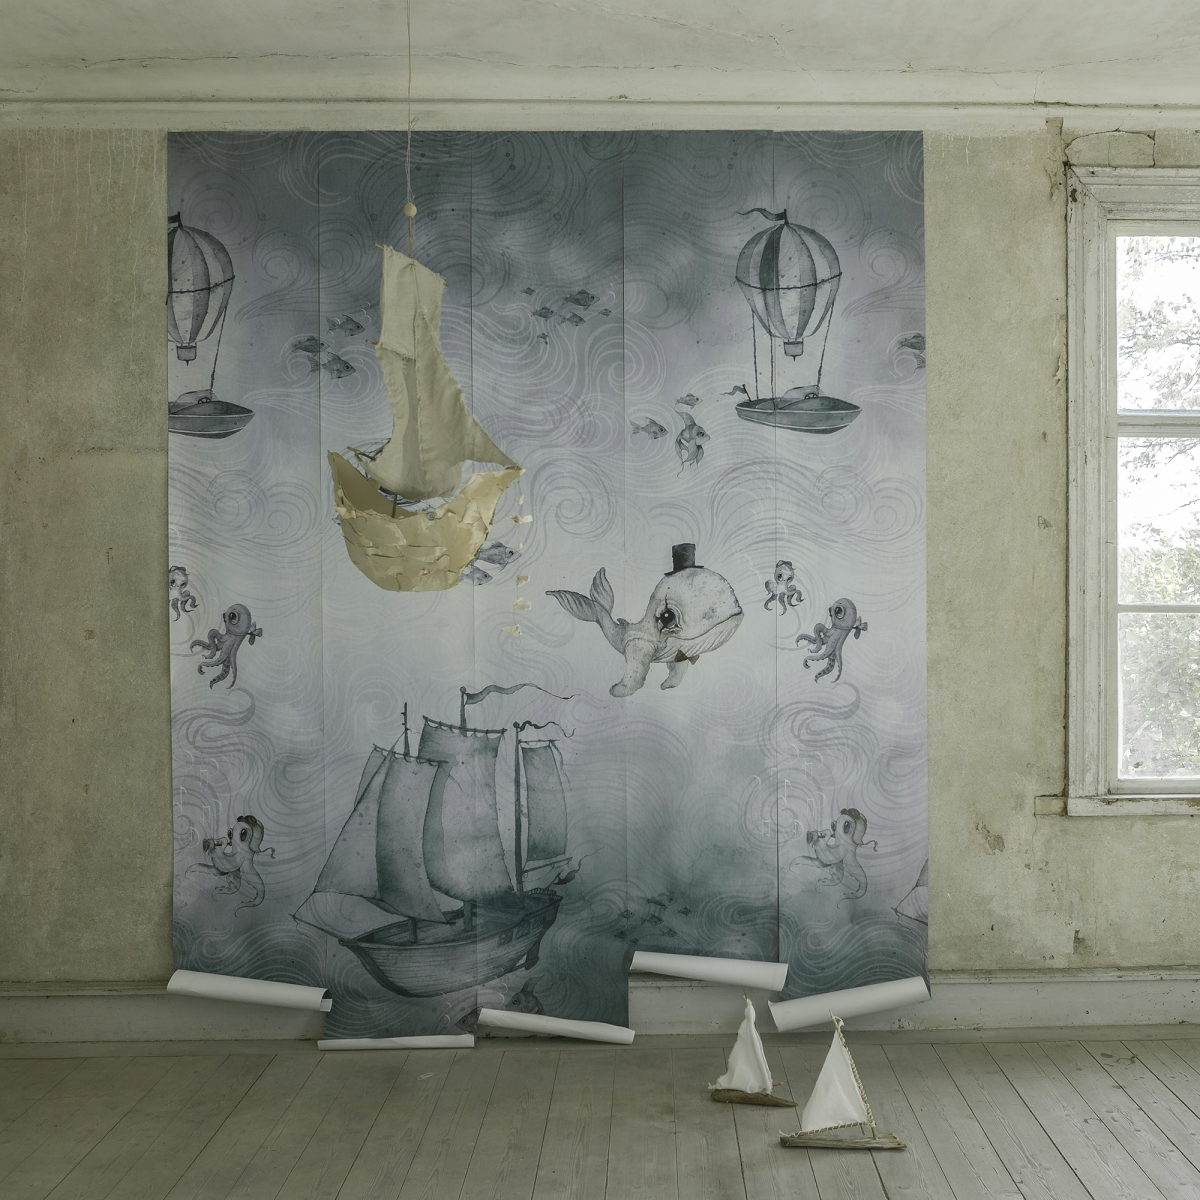 Ocean Stories kinderbehang van Jimmy Cricket | mooi behang voor kinderkamer